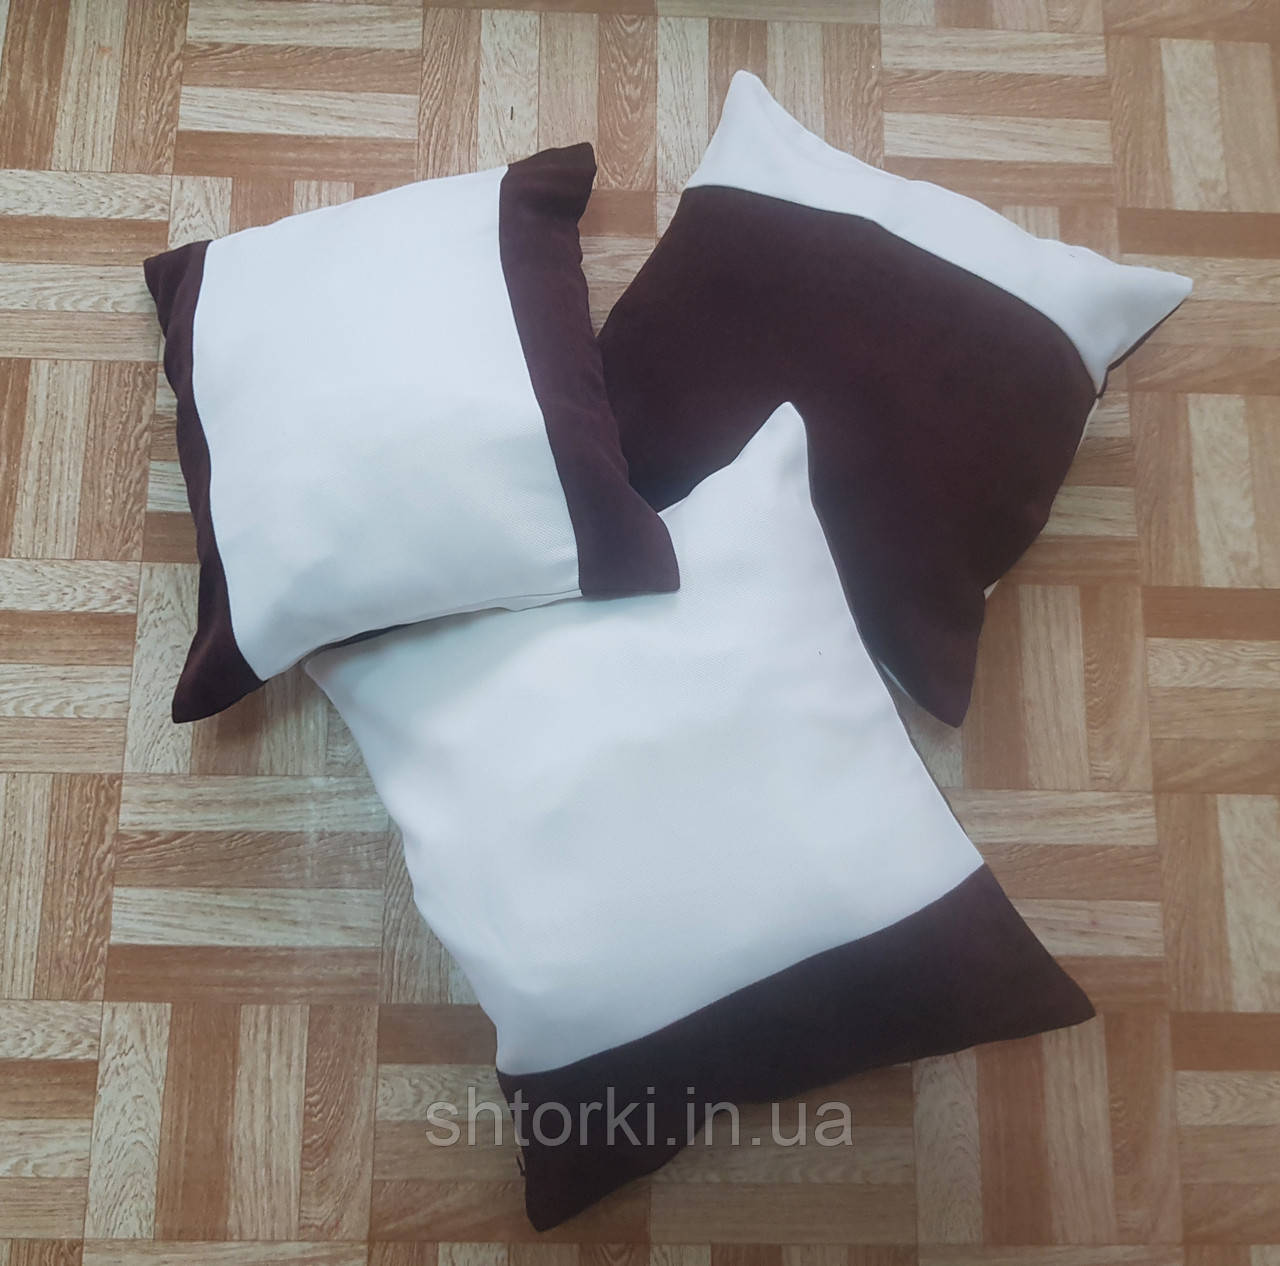 Комплект подушек Мевлана шоколад, 3шт